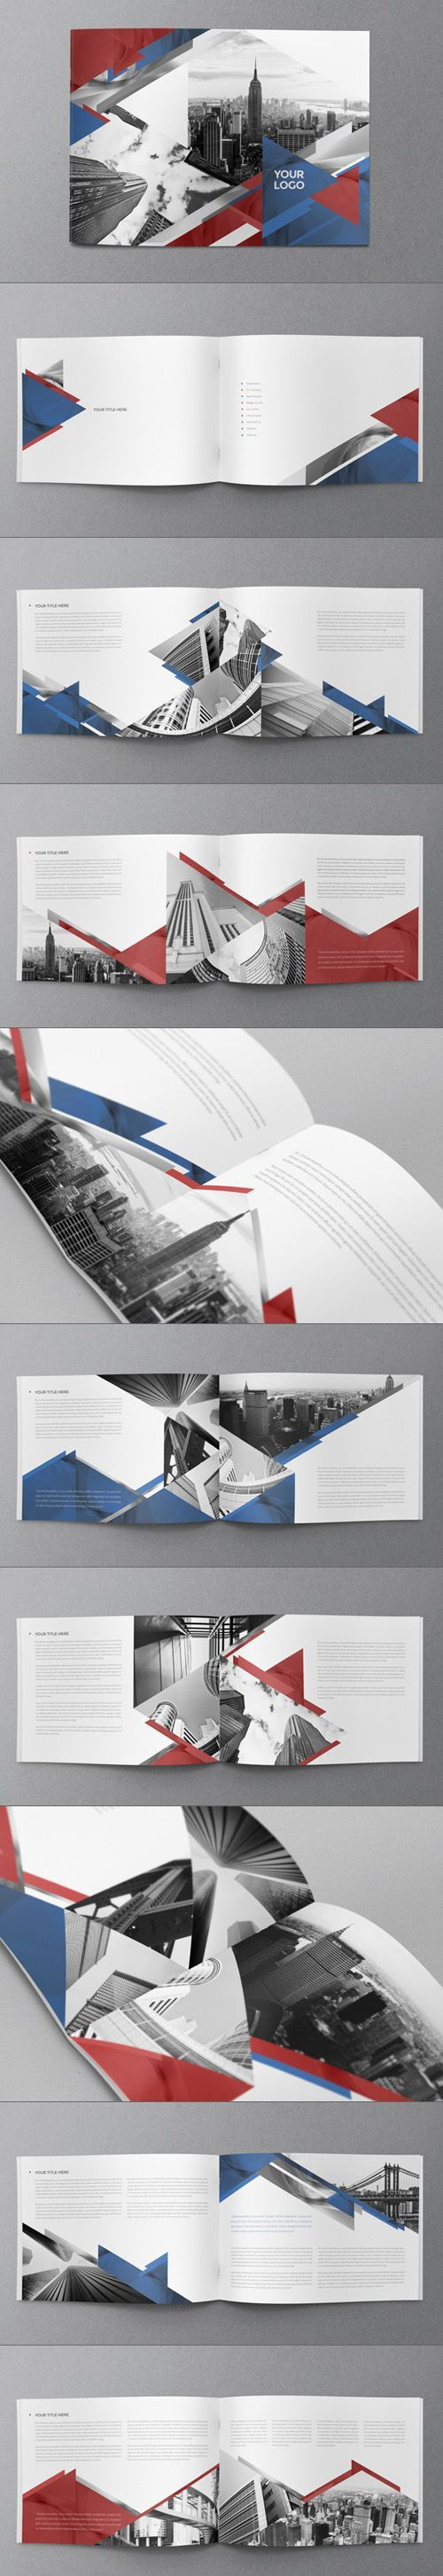 15 Creative Print Ready Business Brochure Designs | Design | Graphic Design…